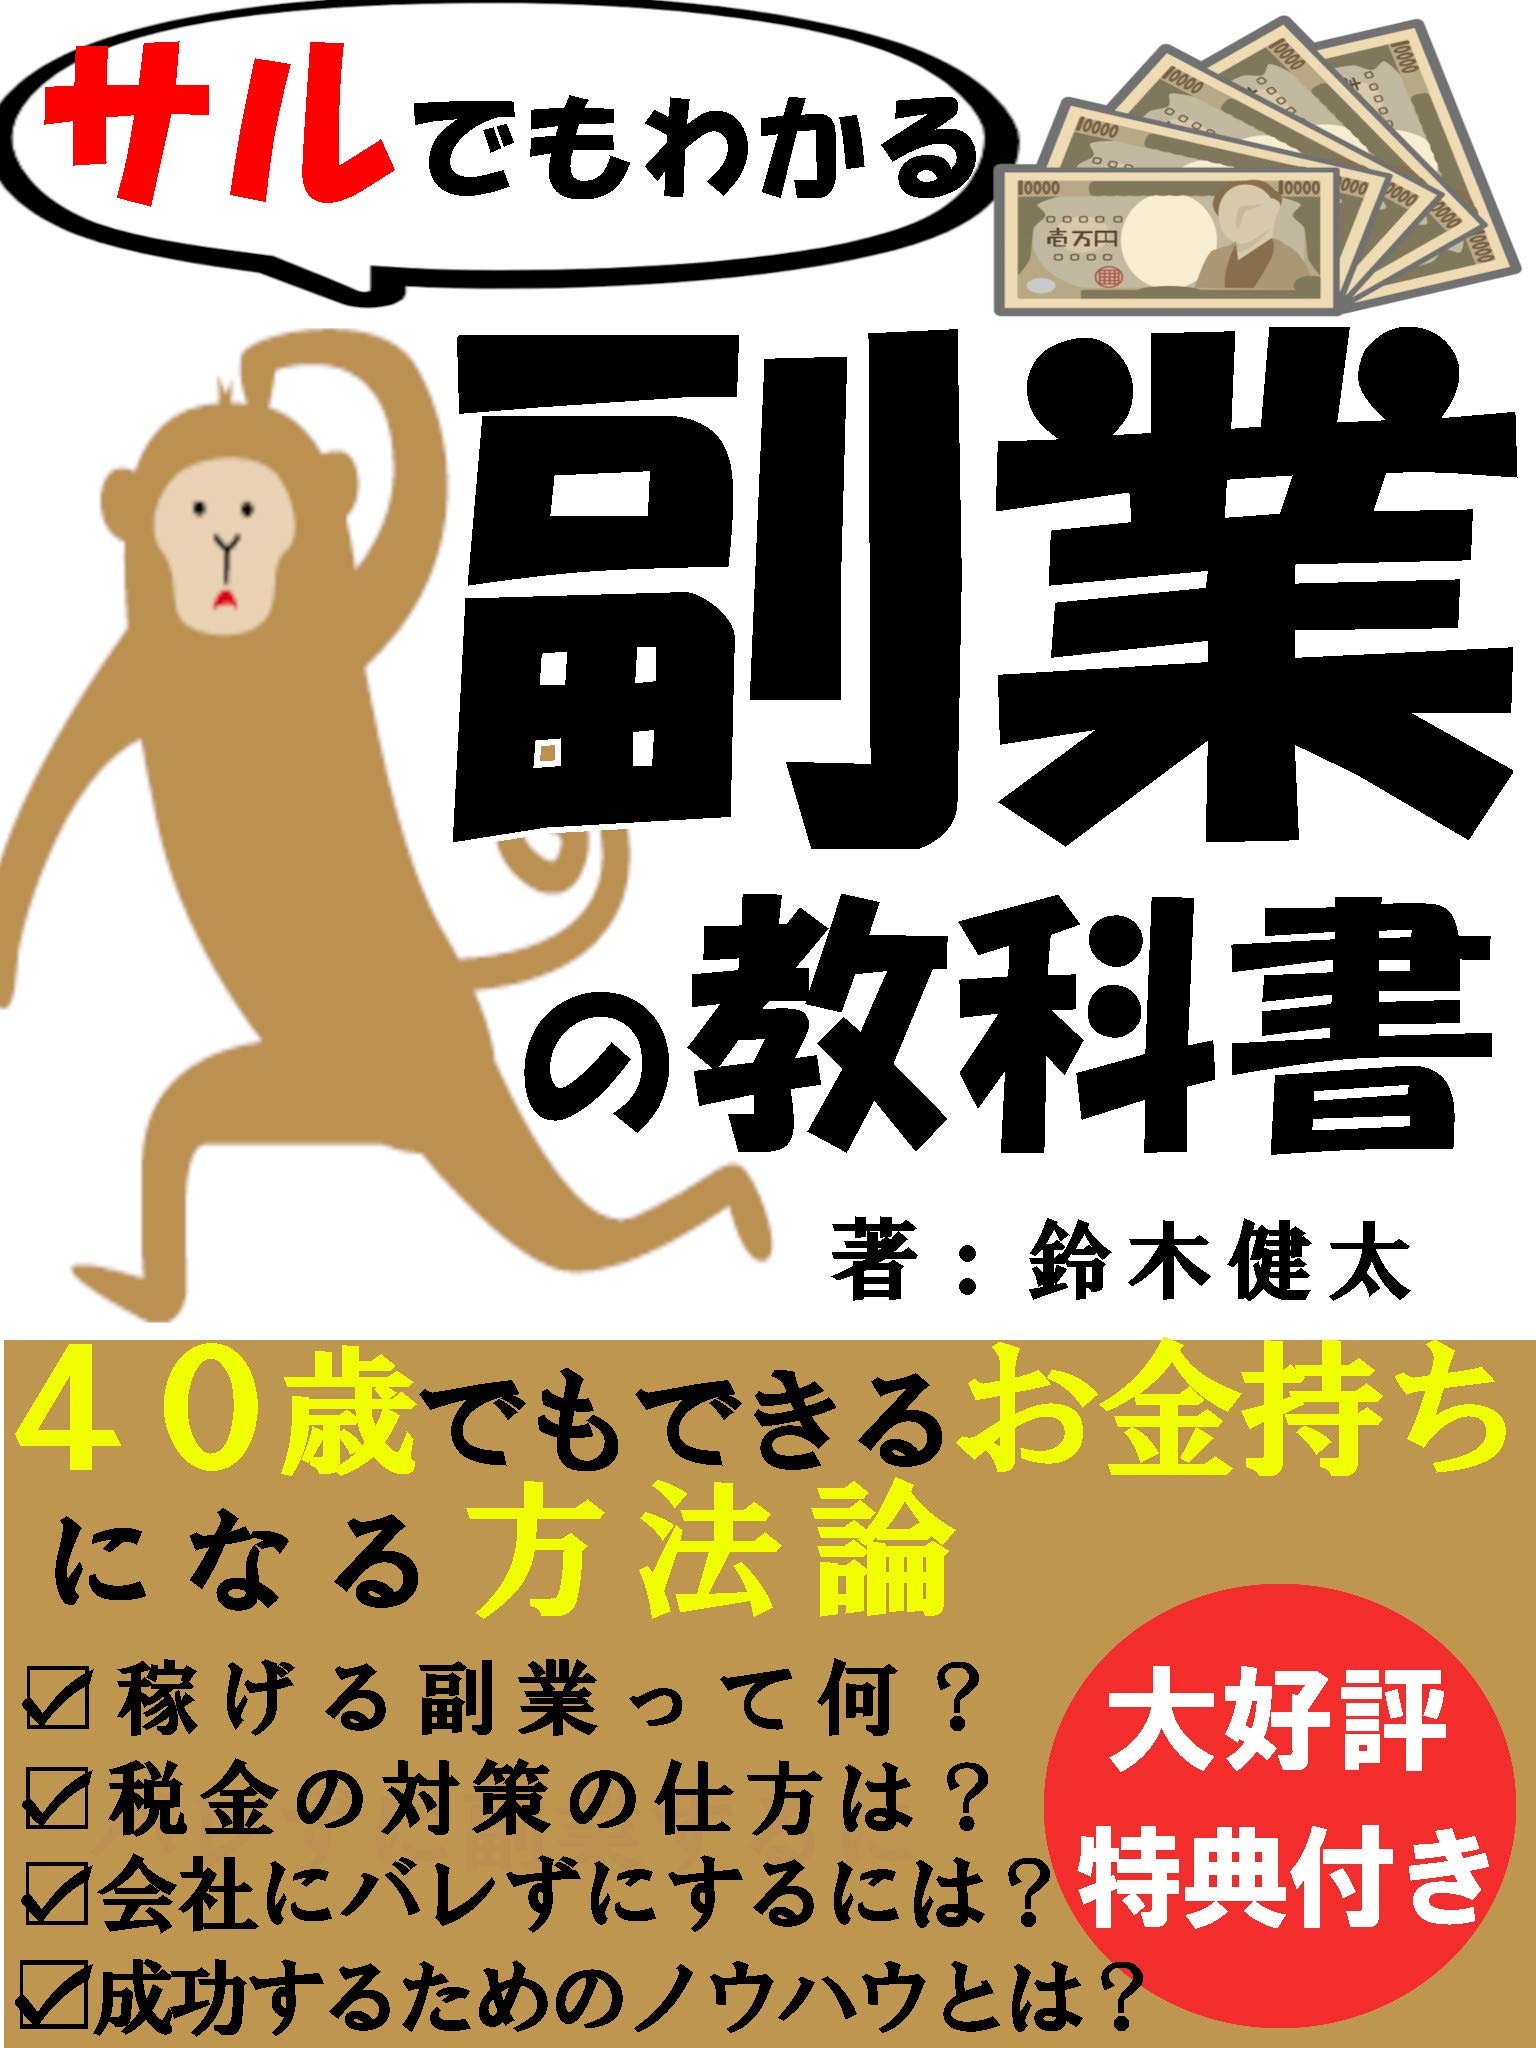 sarudemowakaruhukugyounokyoukasyoyonnzyussaidemodekiruokanemotininaruhouhouronn (Japanese Edition)